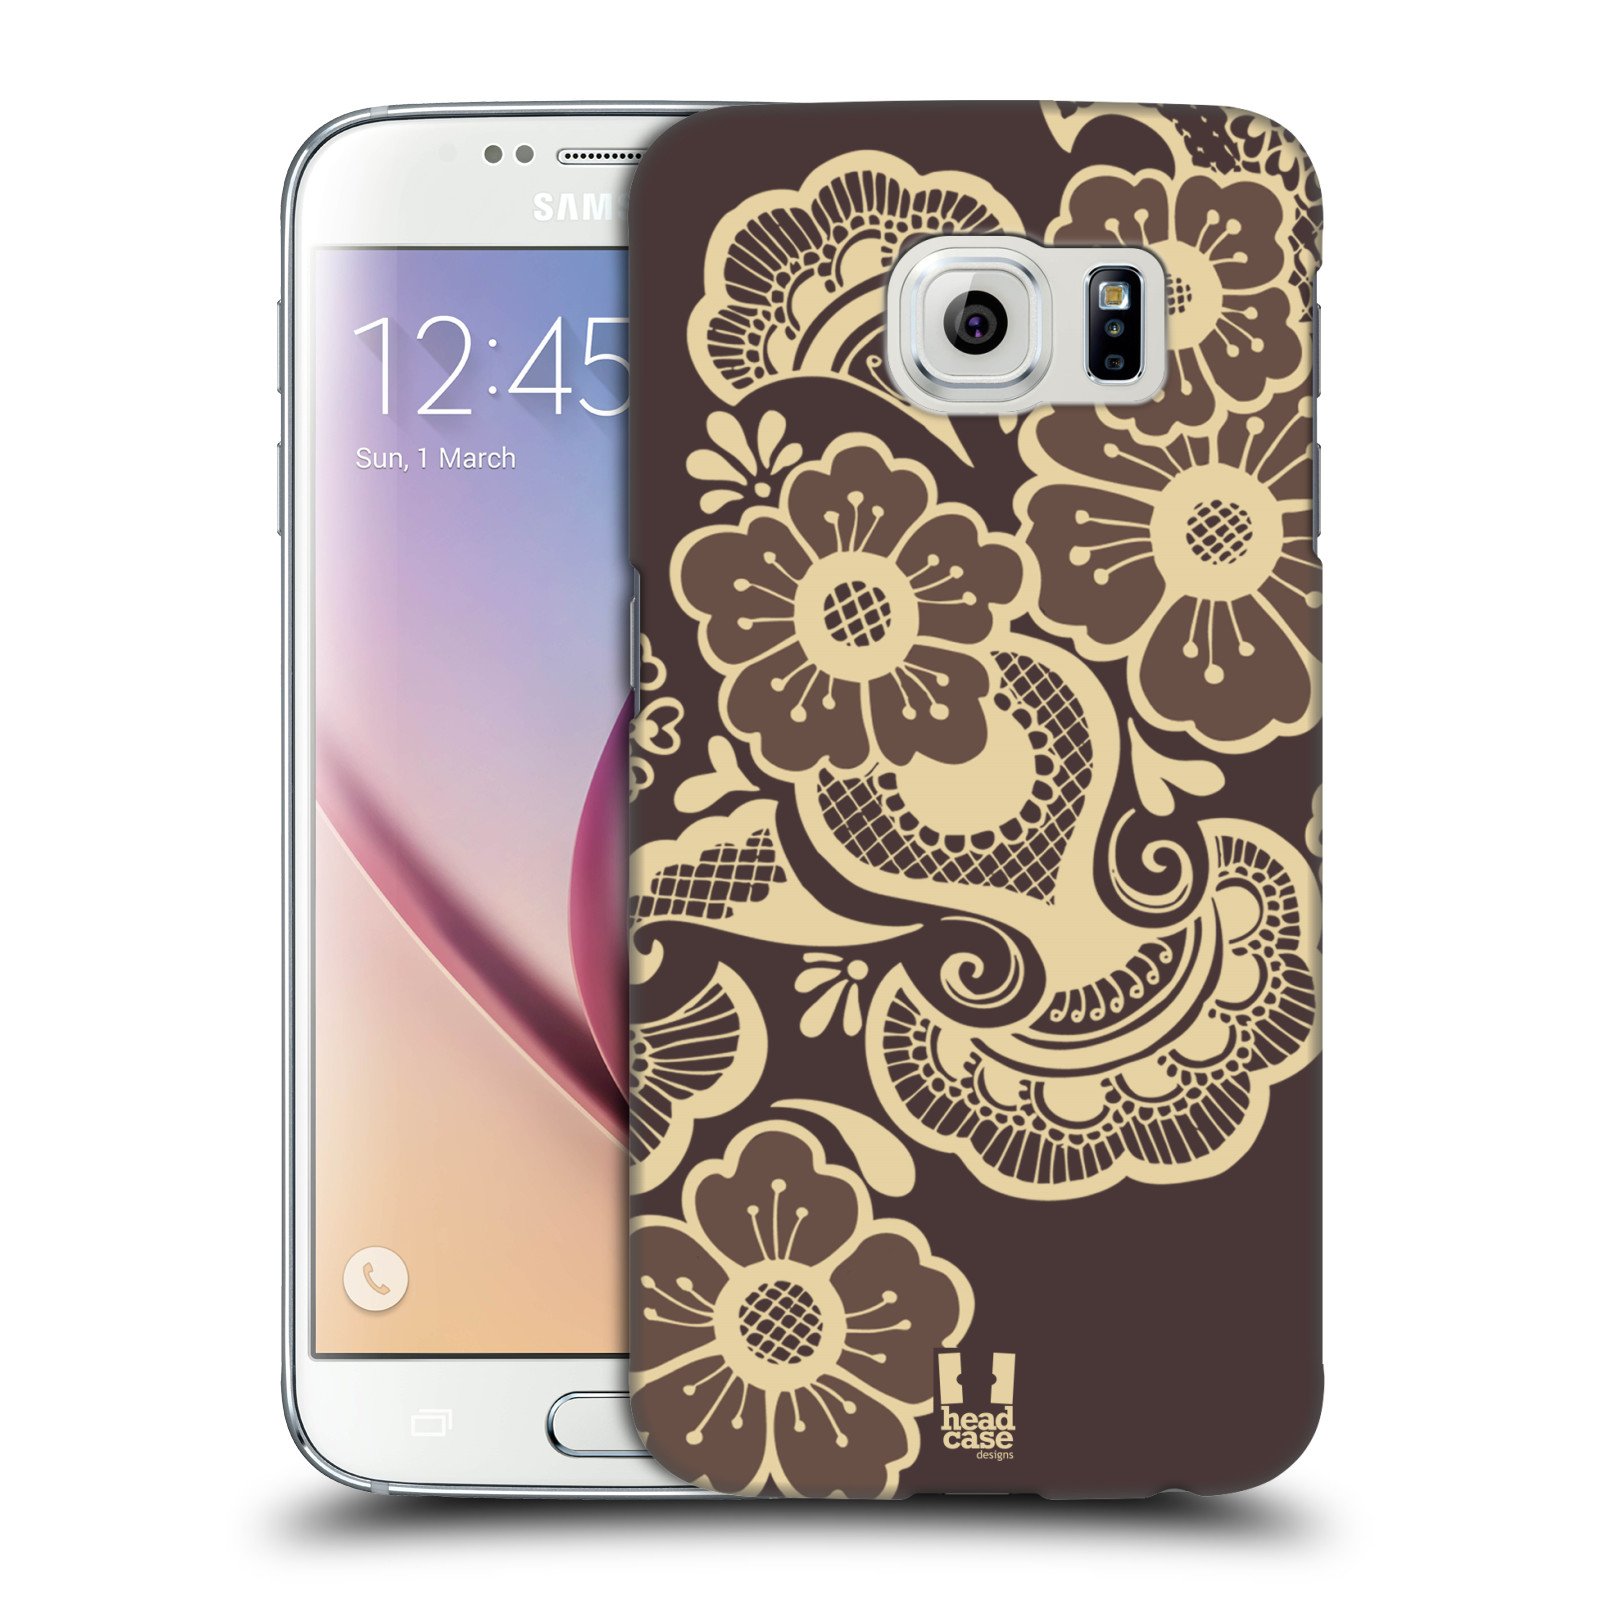 HEAD CASE DESIGNS HENNA HARD BACK CASE FOR SAMSUNG PHONES